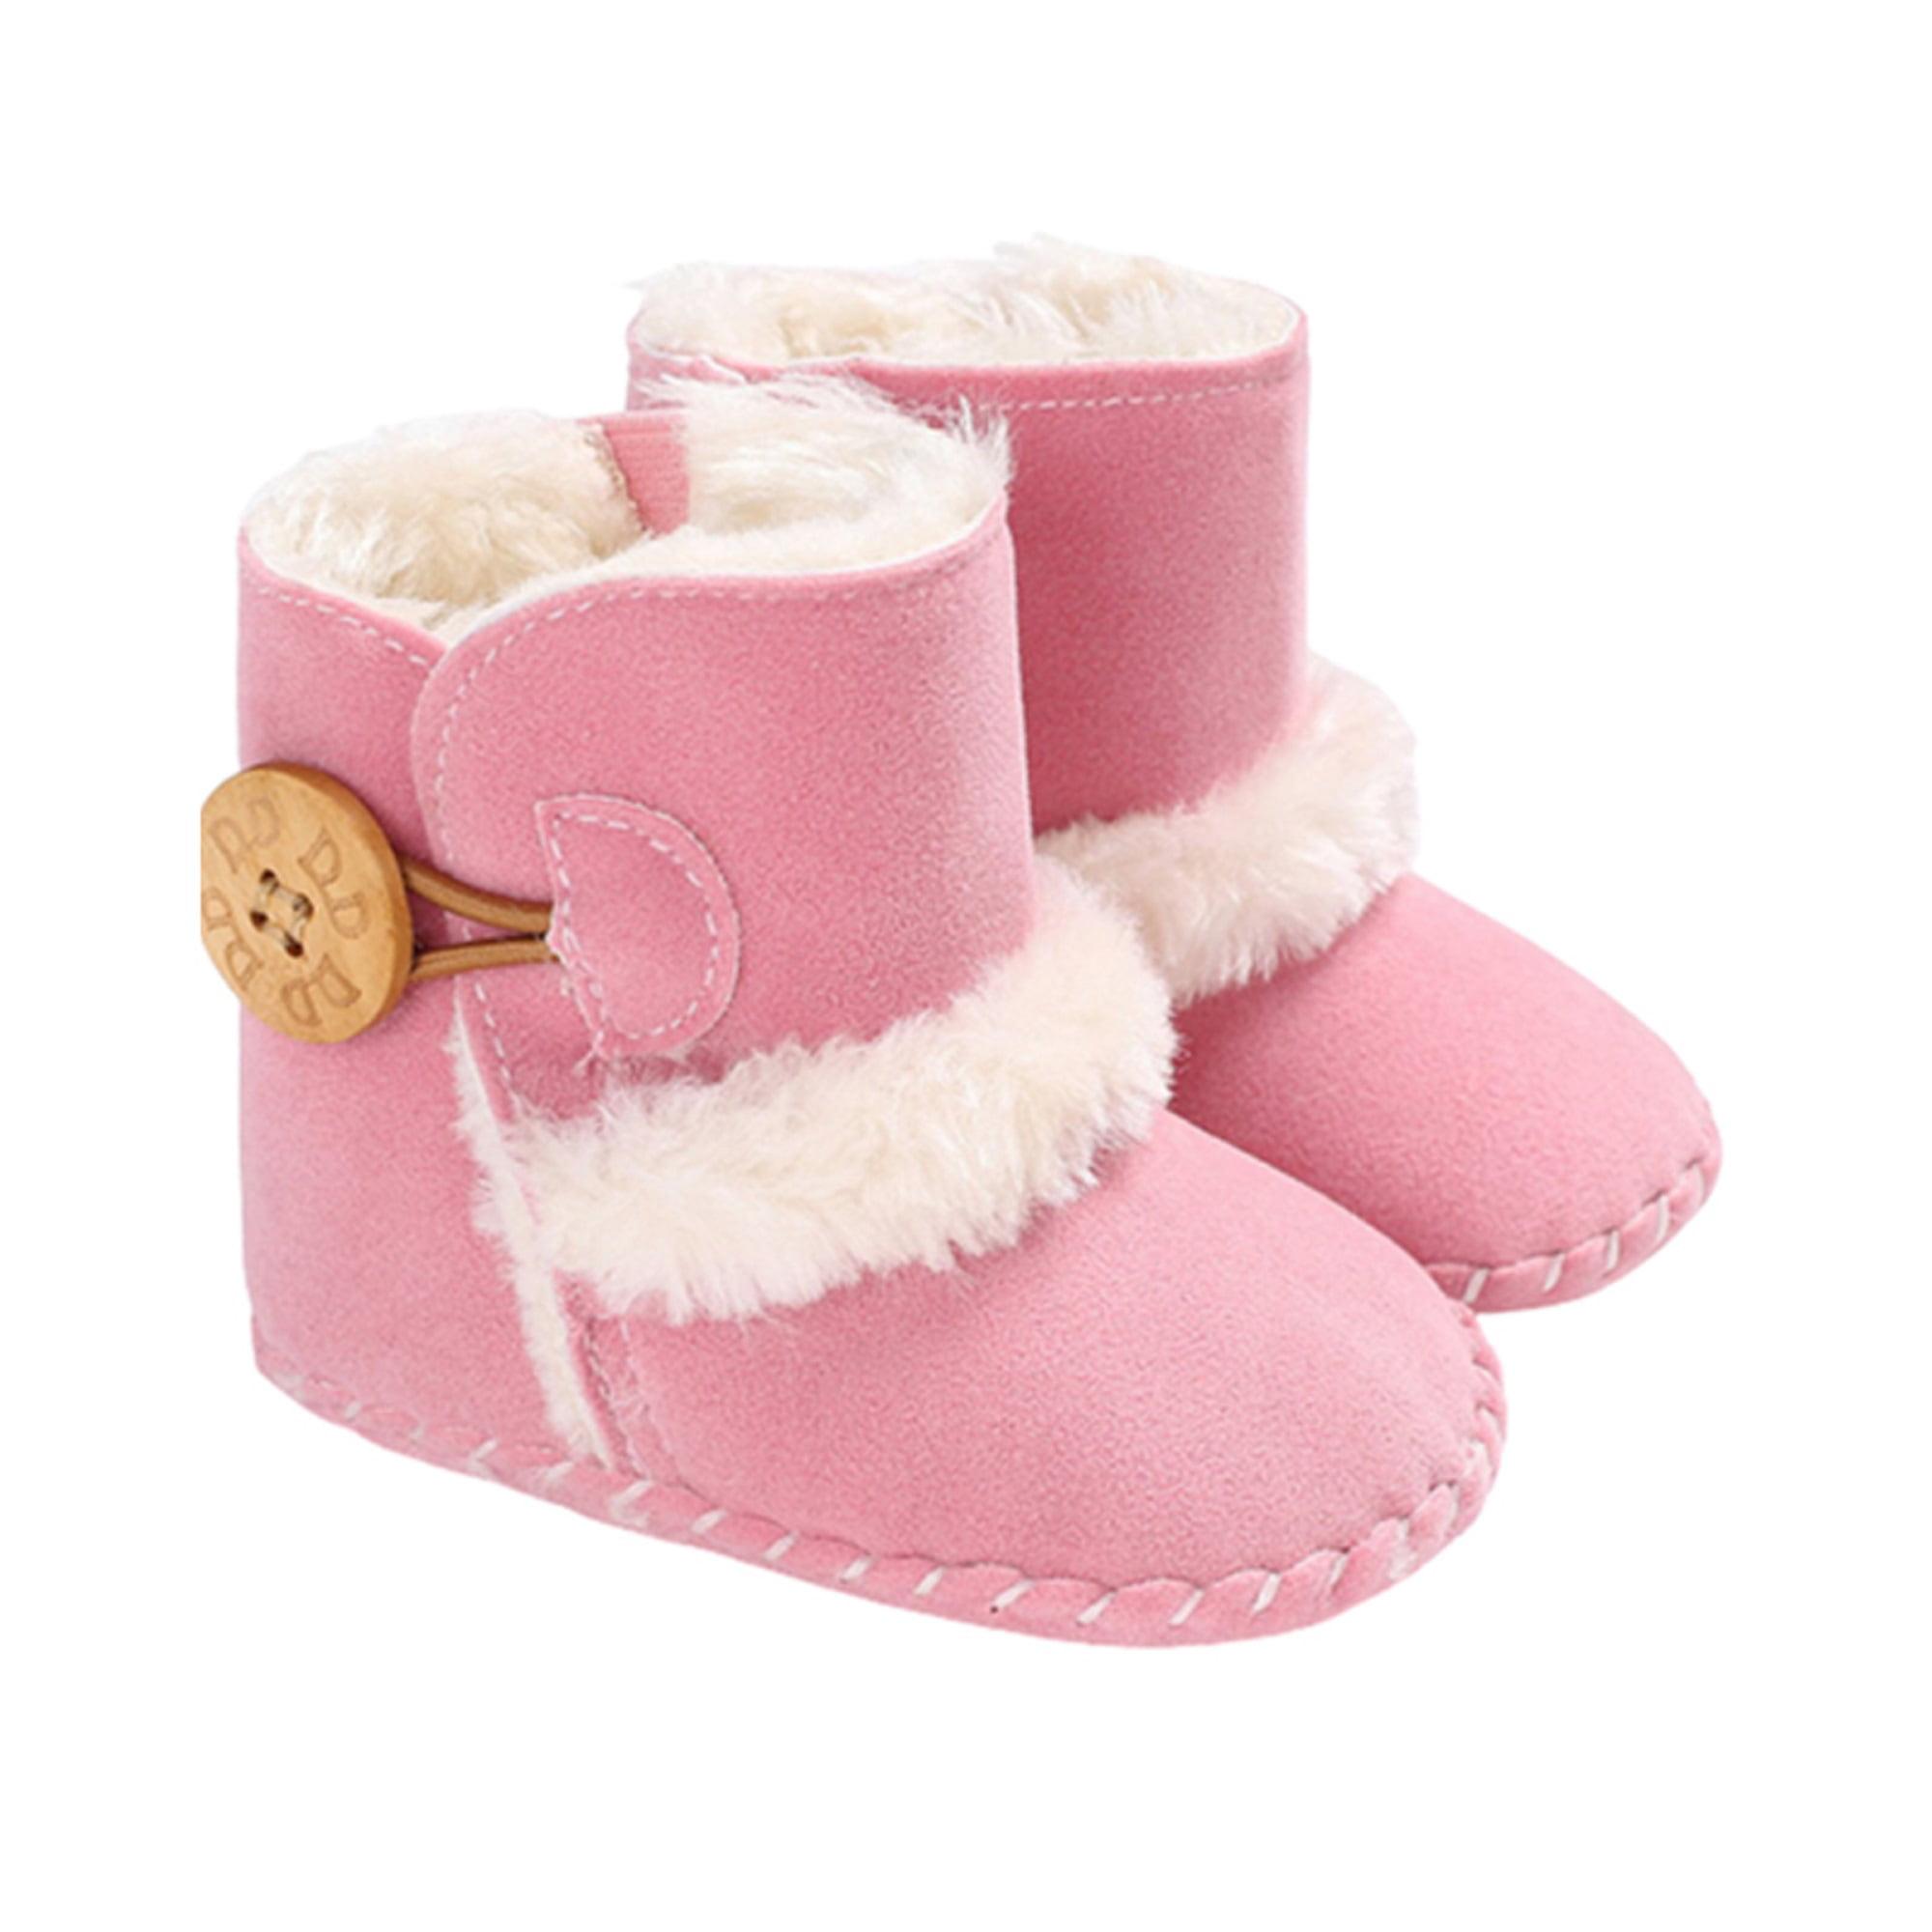 Citgeett Baby Girl Boy Anti-Slip Warm